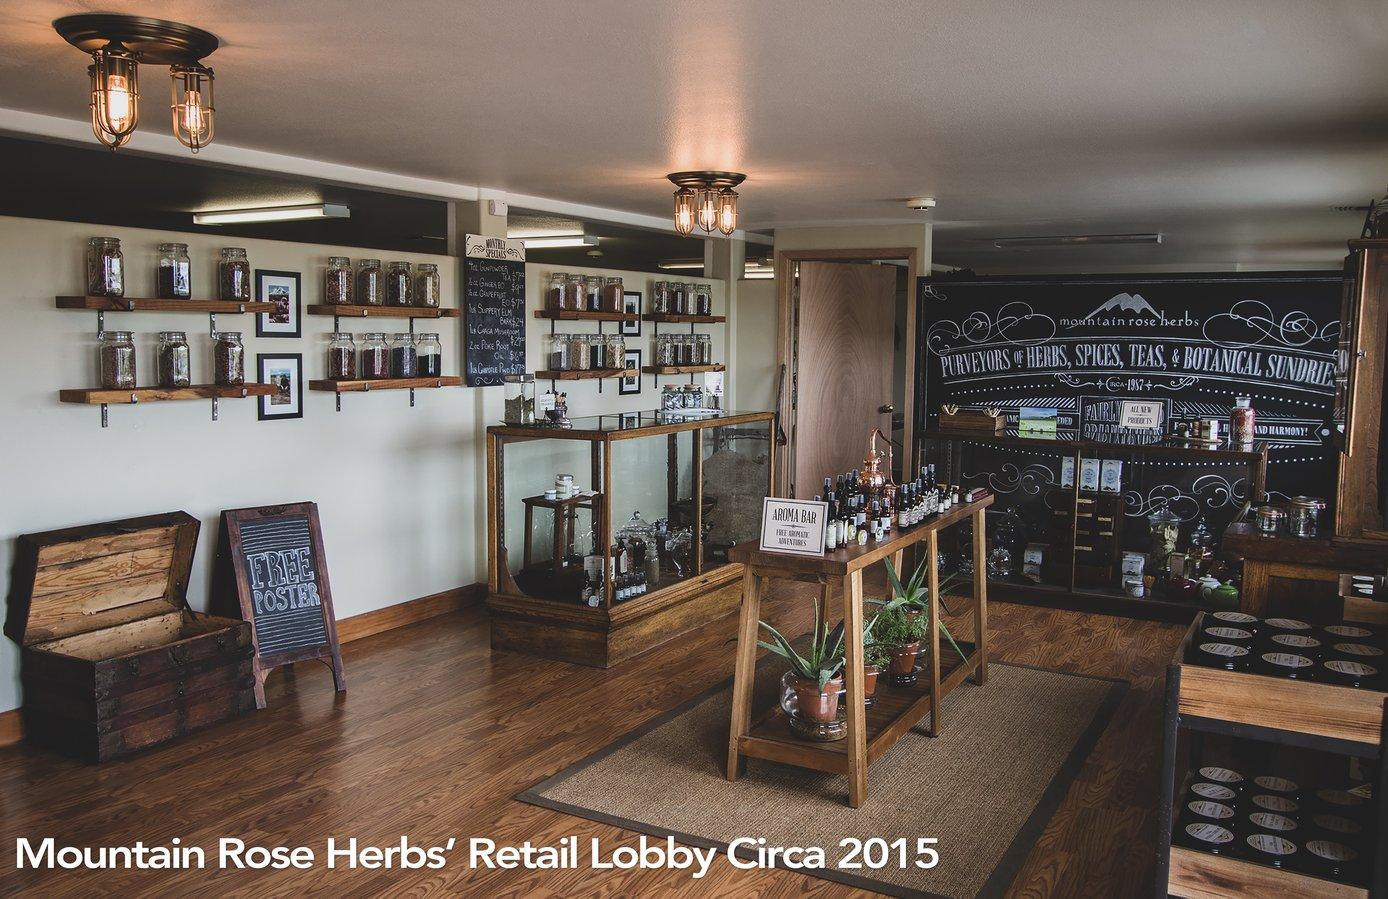 Mountain Rose Herbs Mercantile retail lobby circa 2015